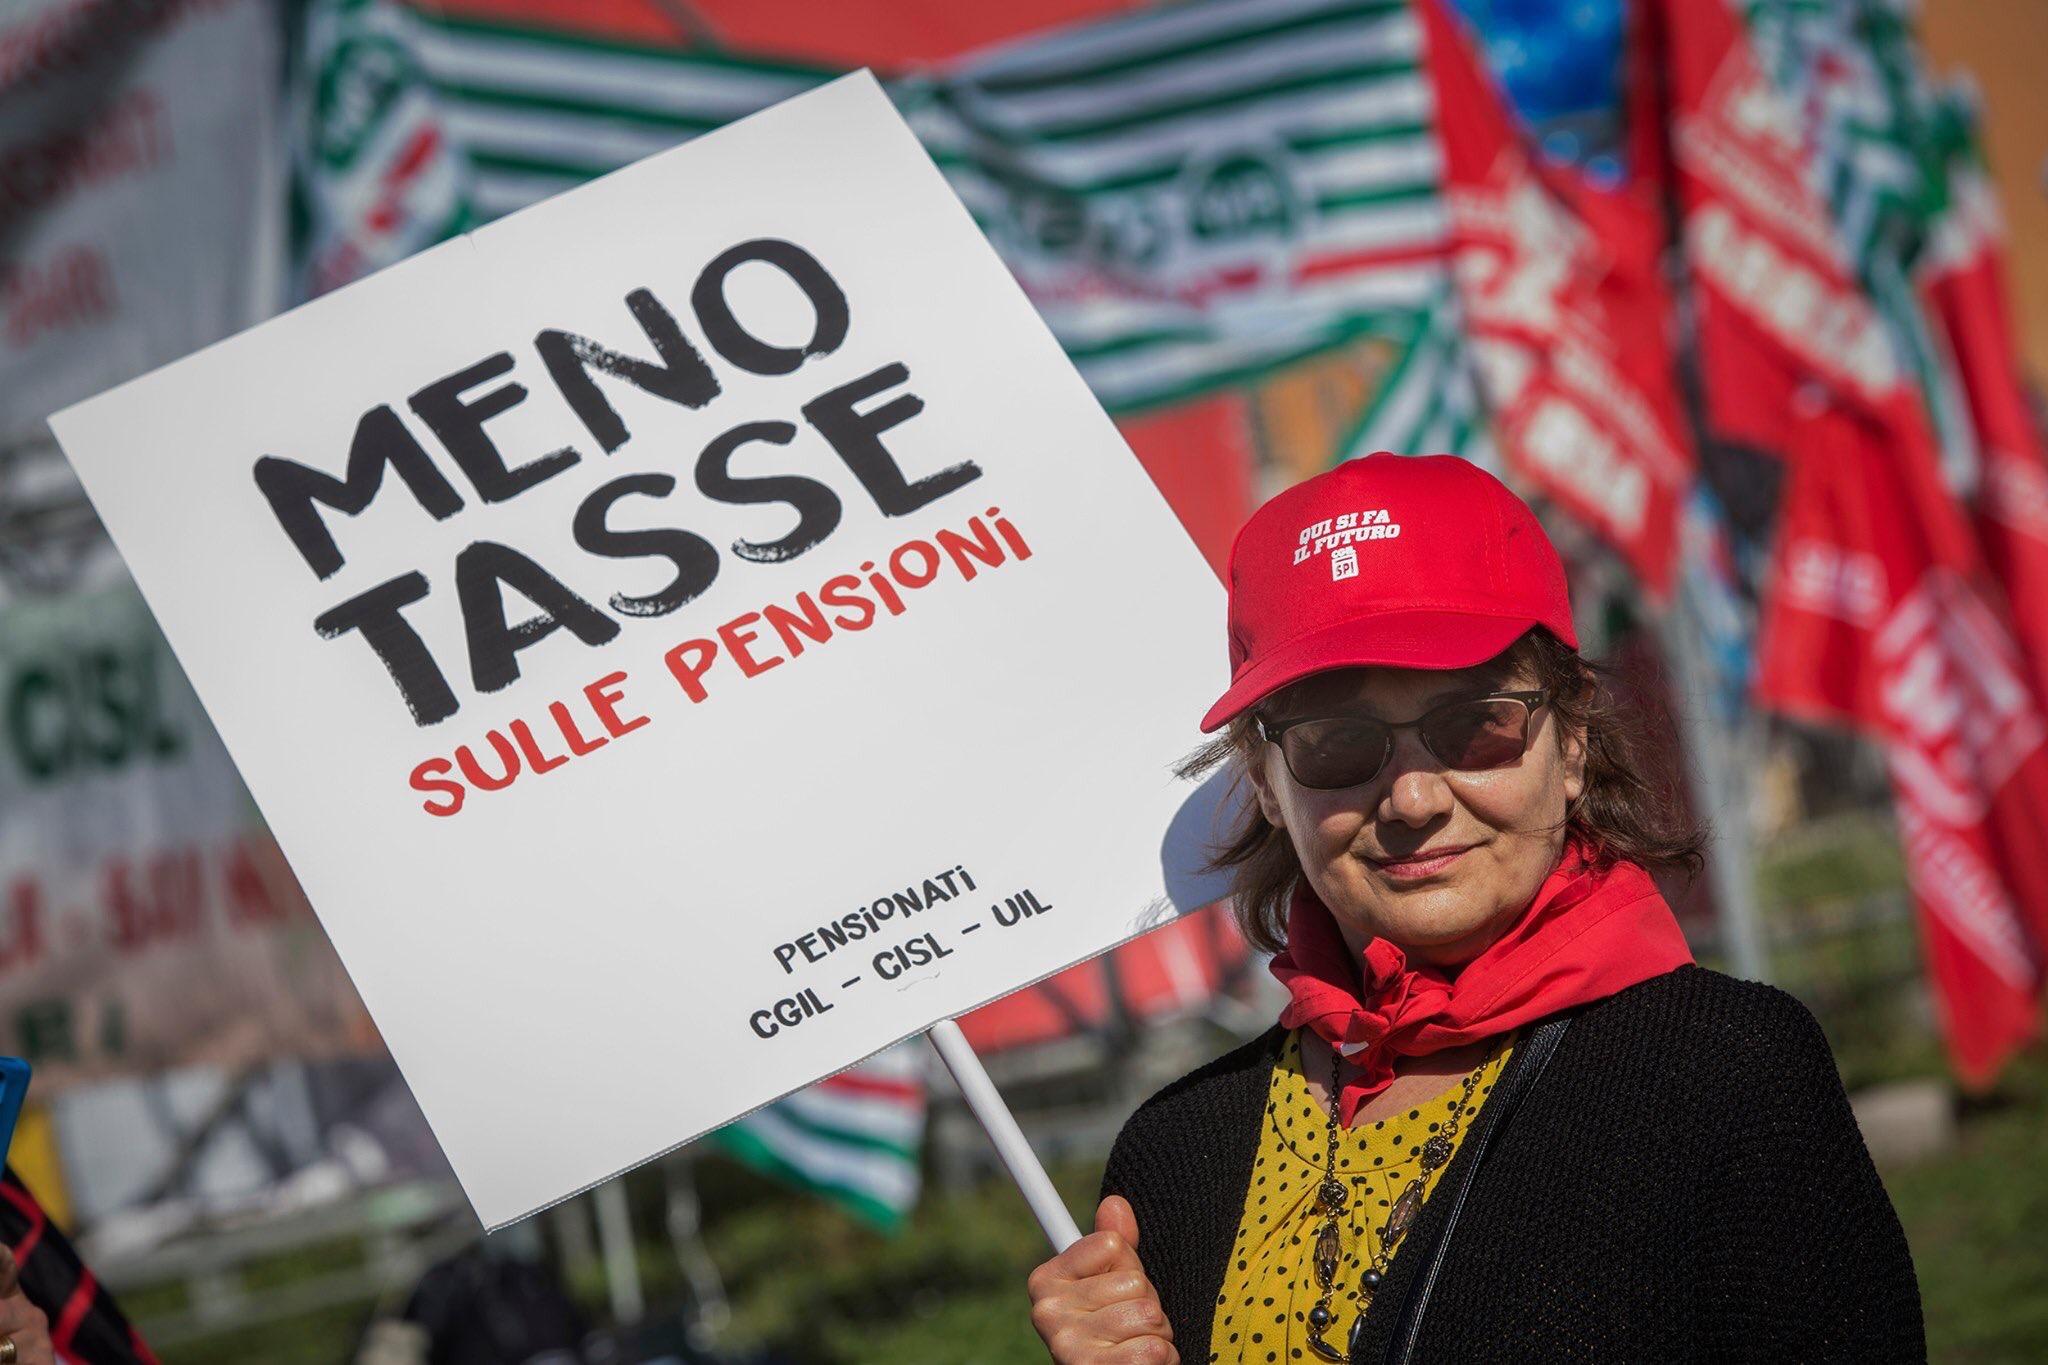 Manifestazione pensioni